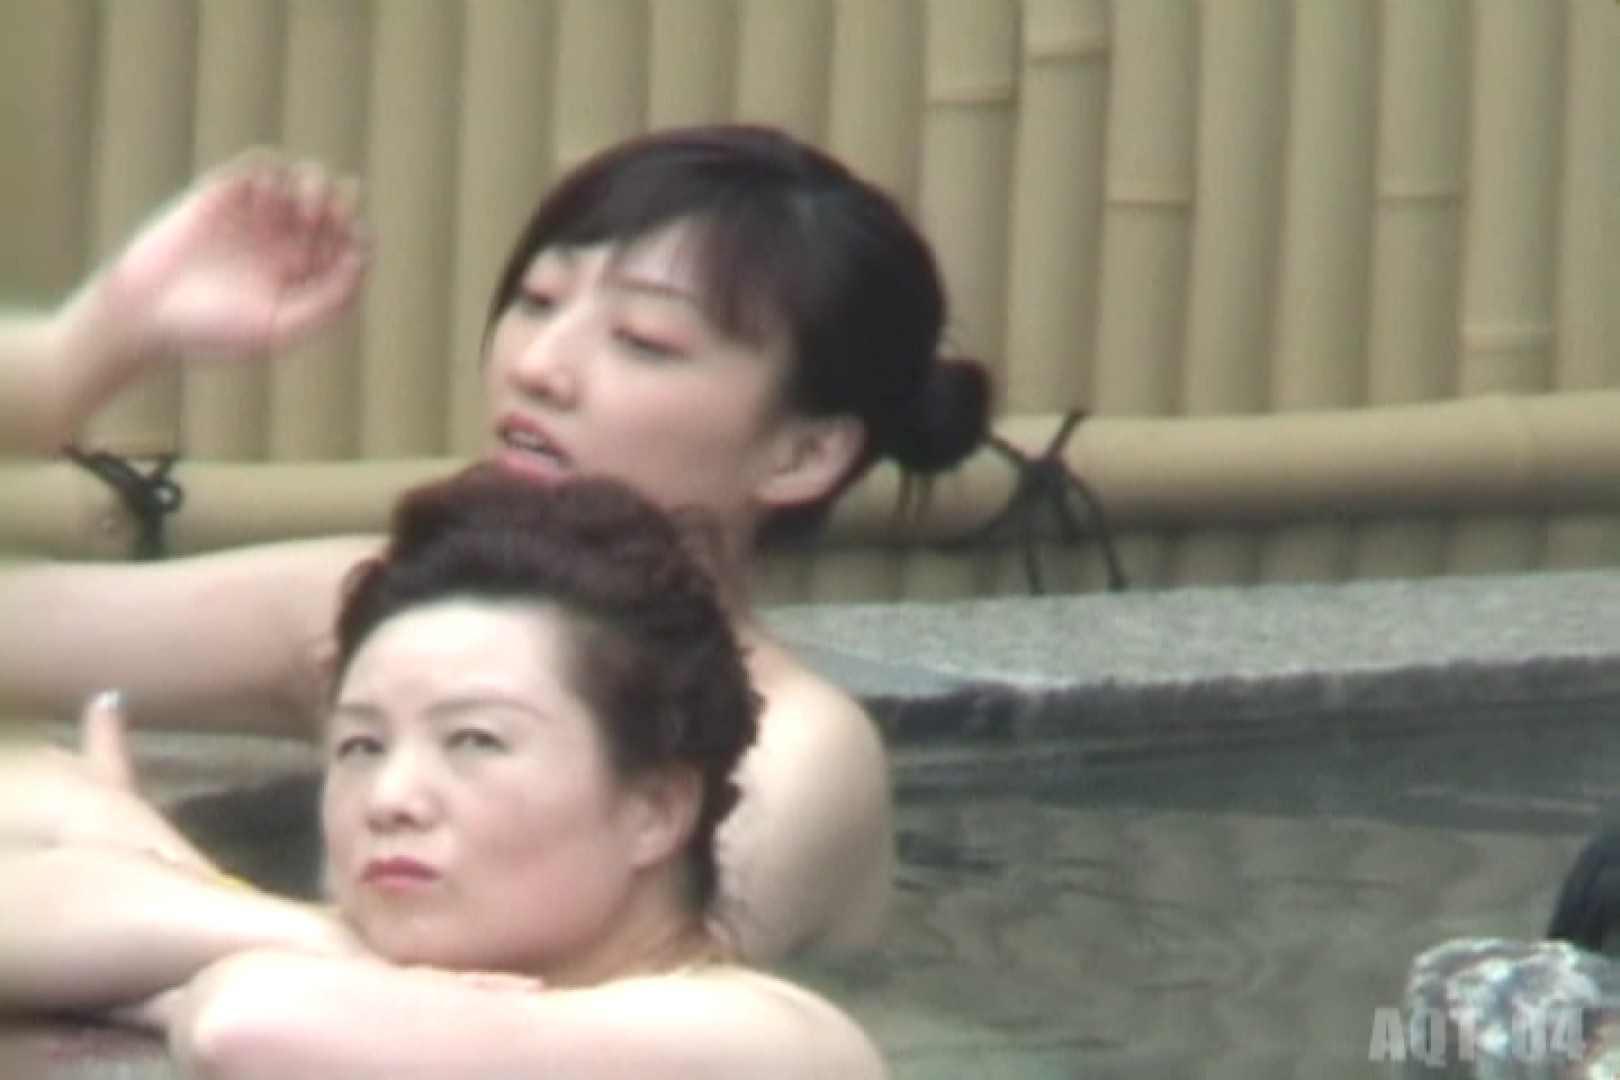 Aquaな露天風呂Vol.743 盗撮映像  75Pix 35